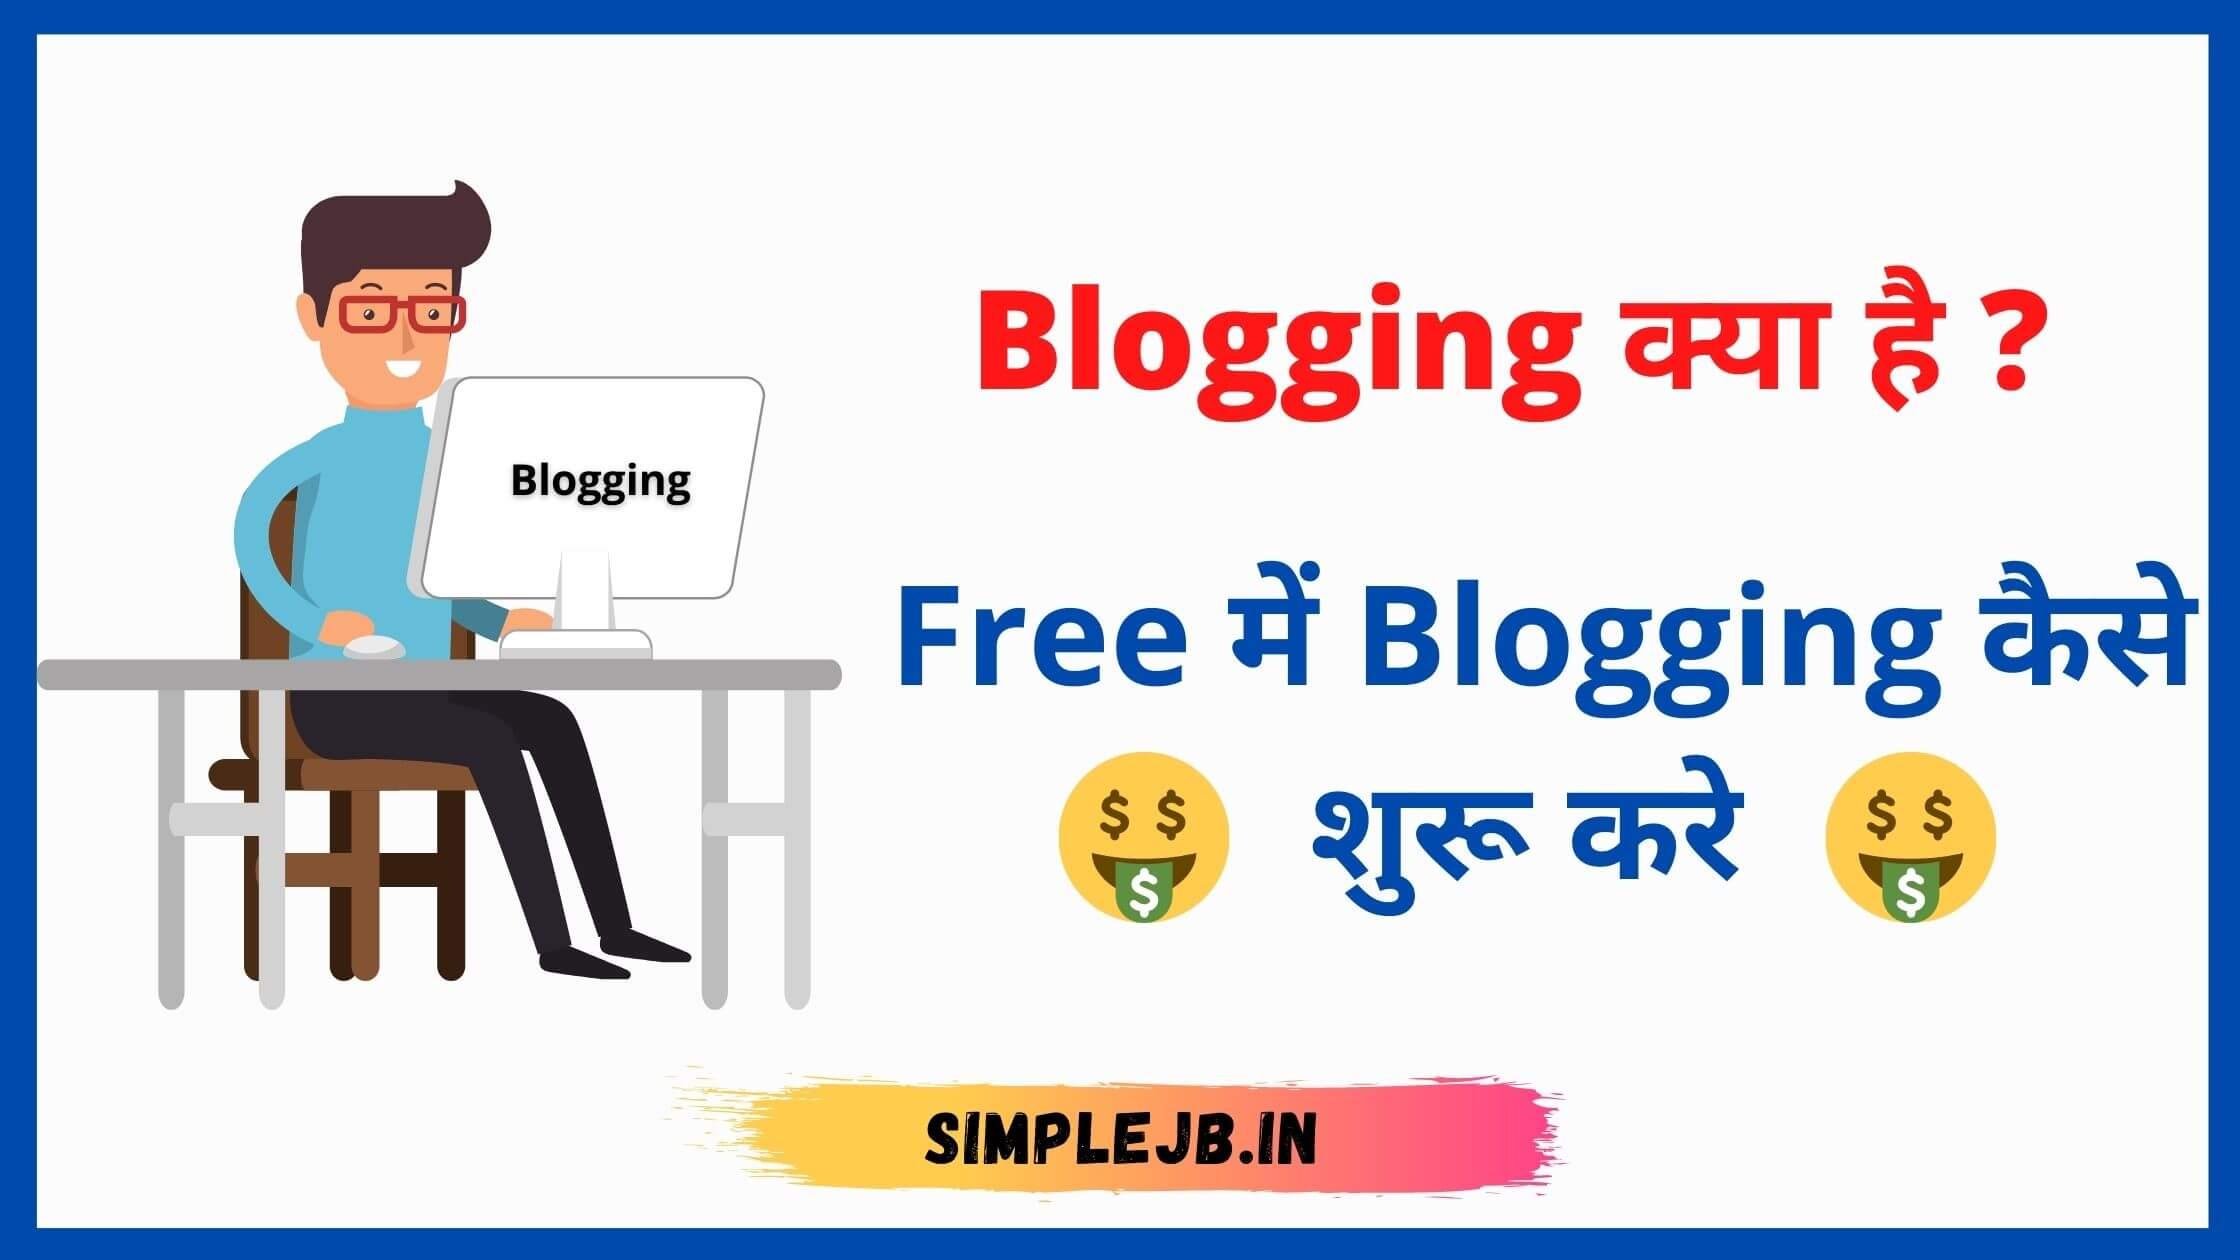 blogging-kya-hai-free-blogging-kaise-kare